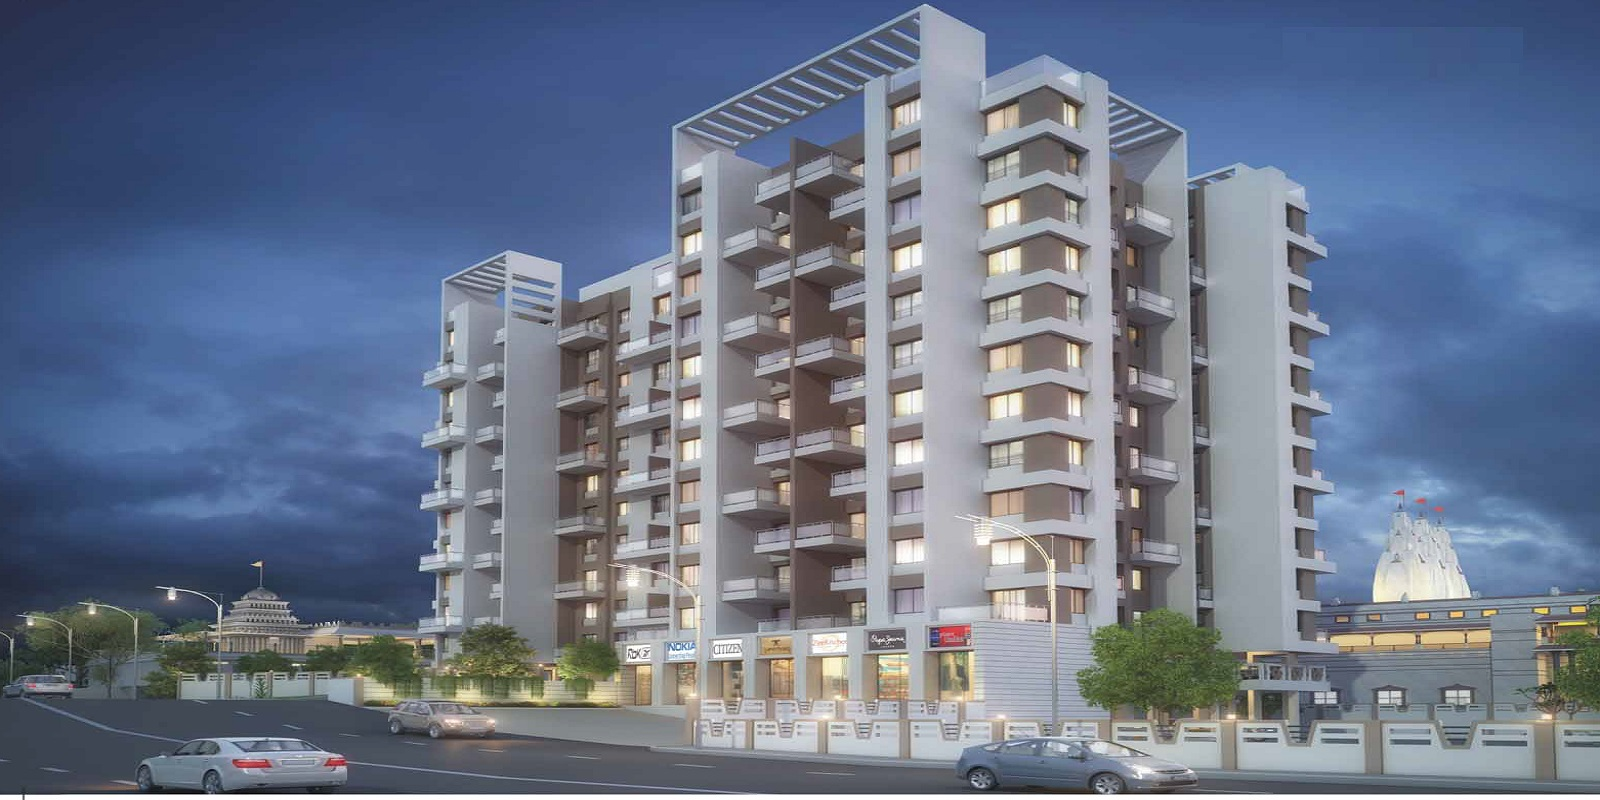 vrindavan barsana dham project project large image1